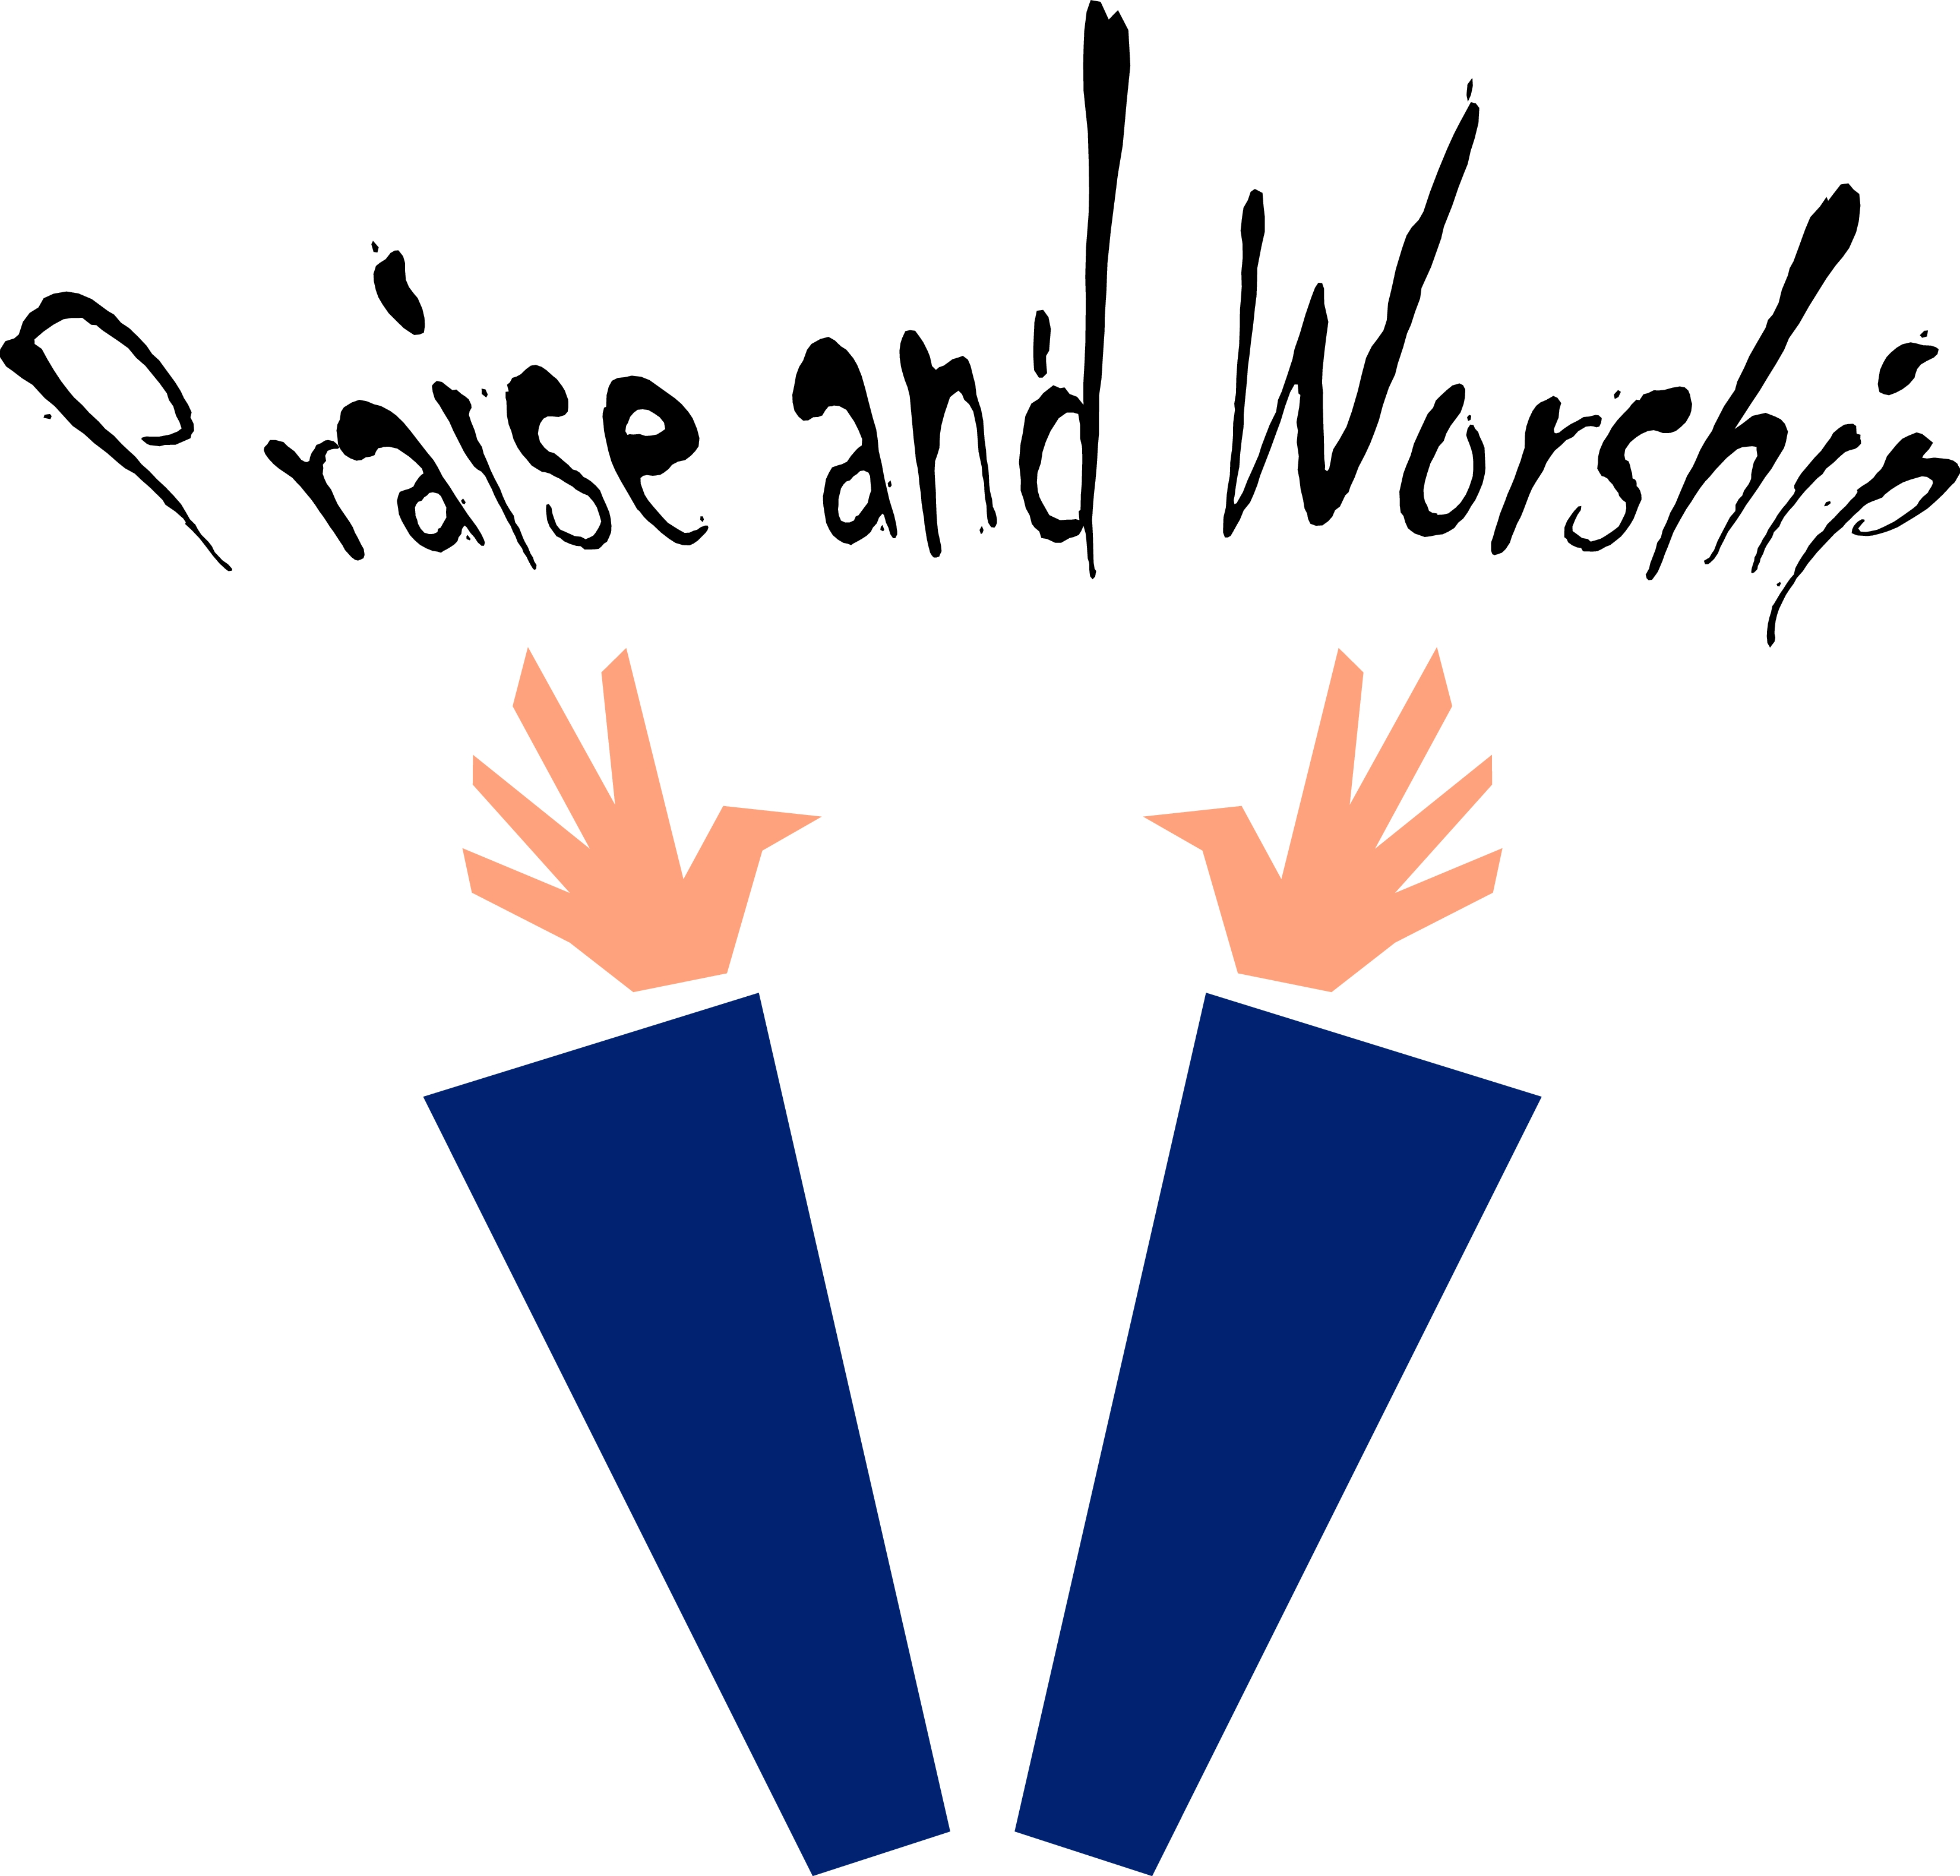 Christian Praise And Worship Clip Art Clipart Best